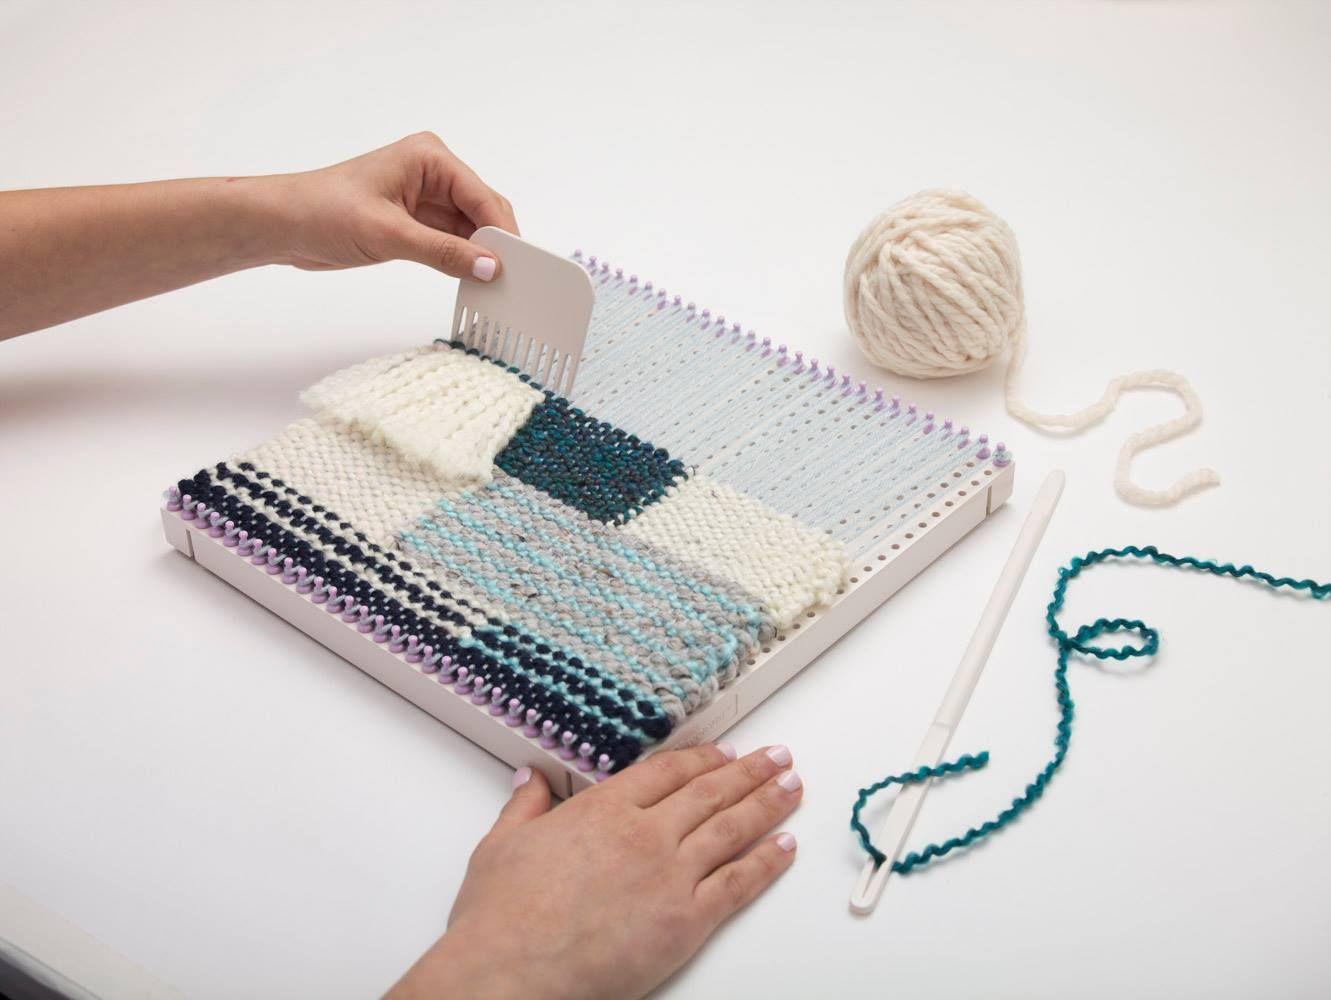 Introducing.... the Martha Stewart Crafts® DIY Weaver | Pinterest